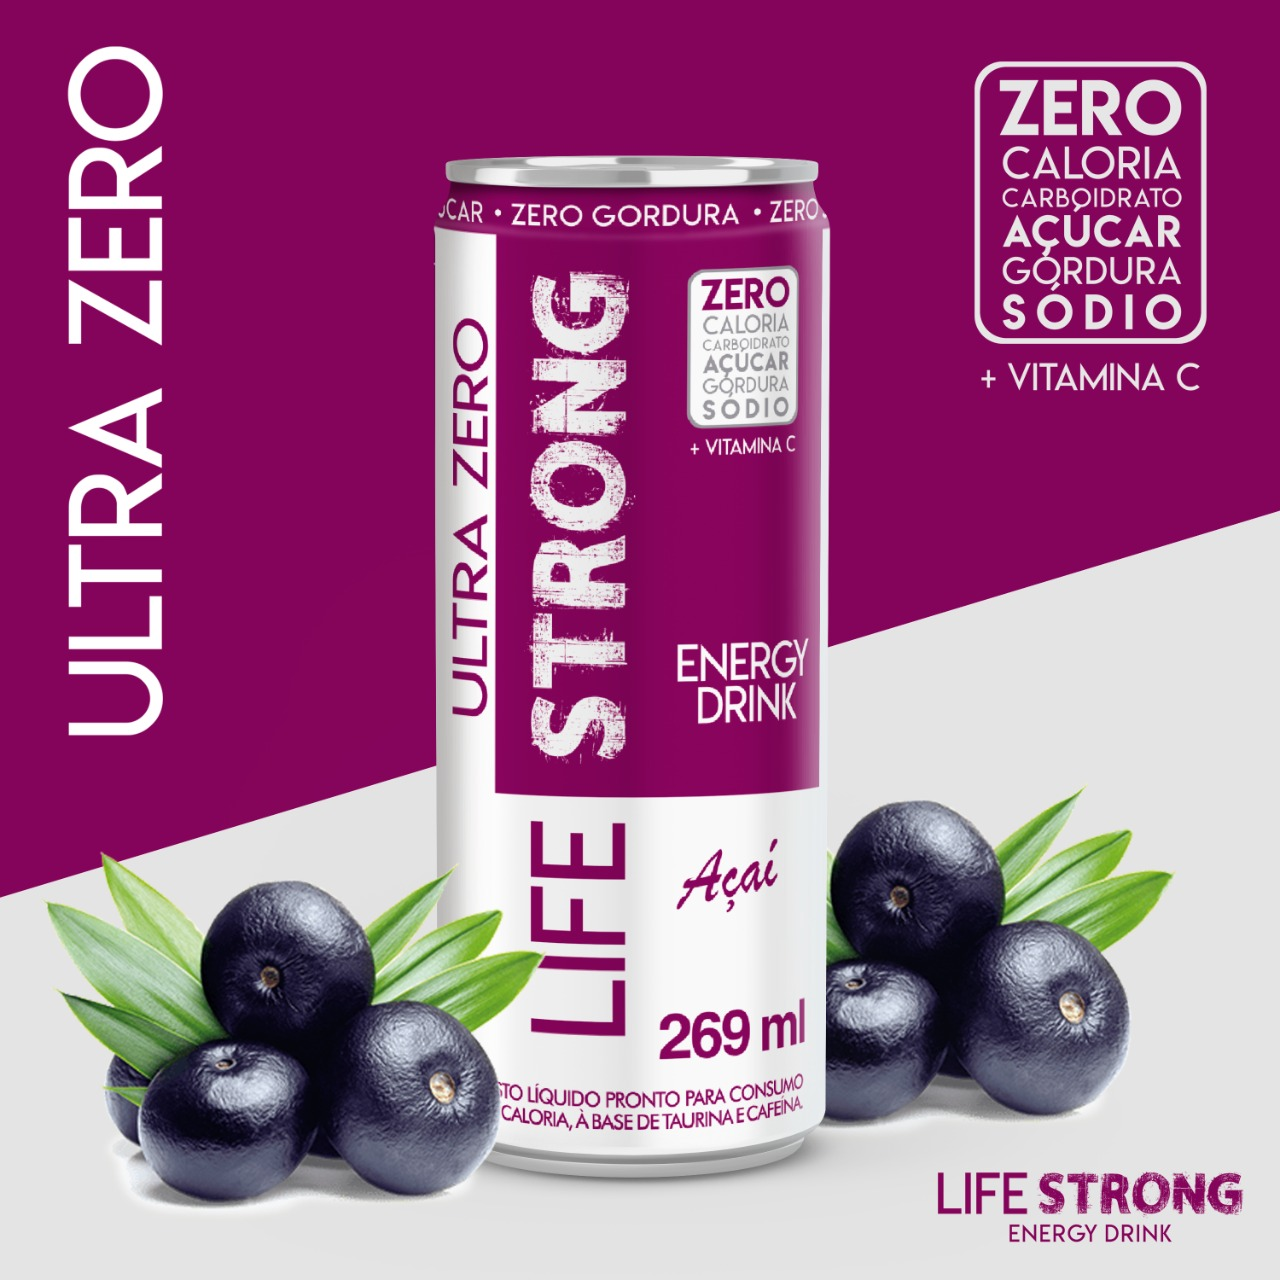 LIFE STRONG ENERGY DRINK ULTRA ZERO - AÇAÍ - PACK COM 24